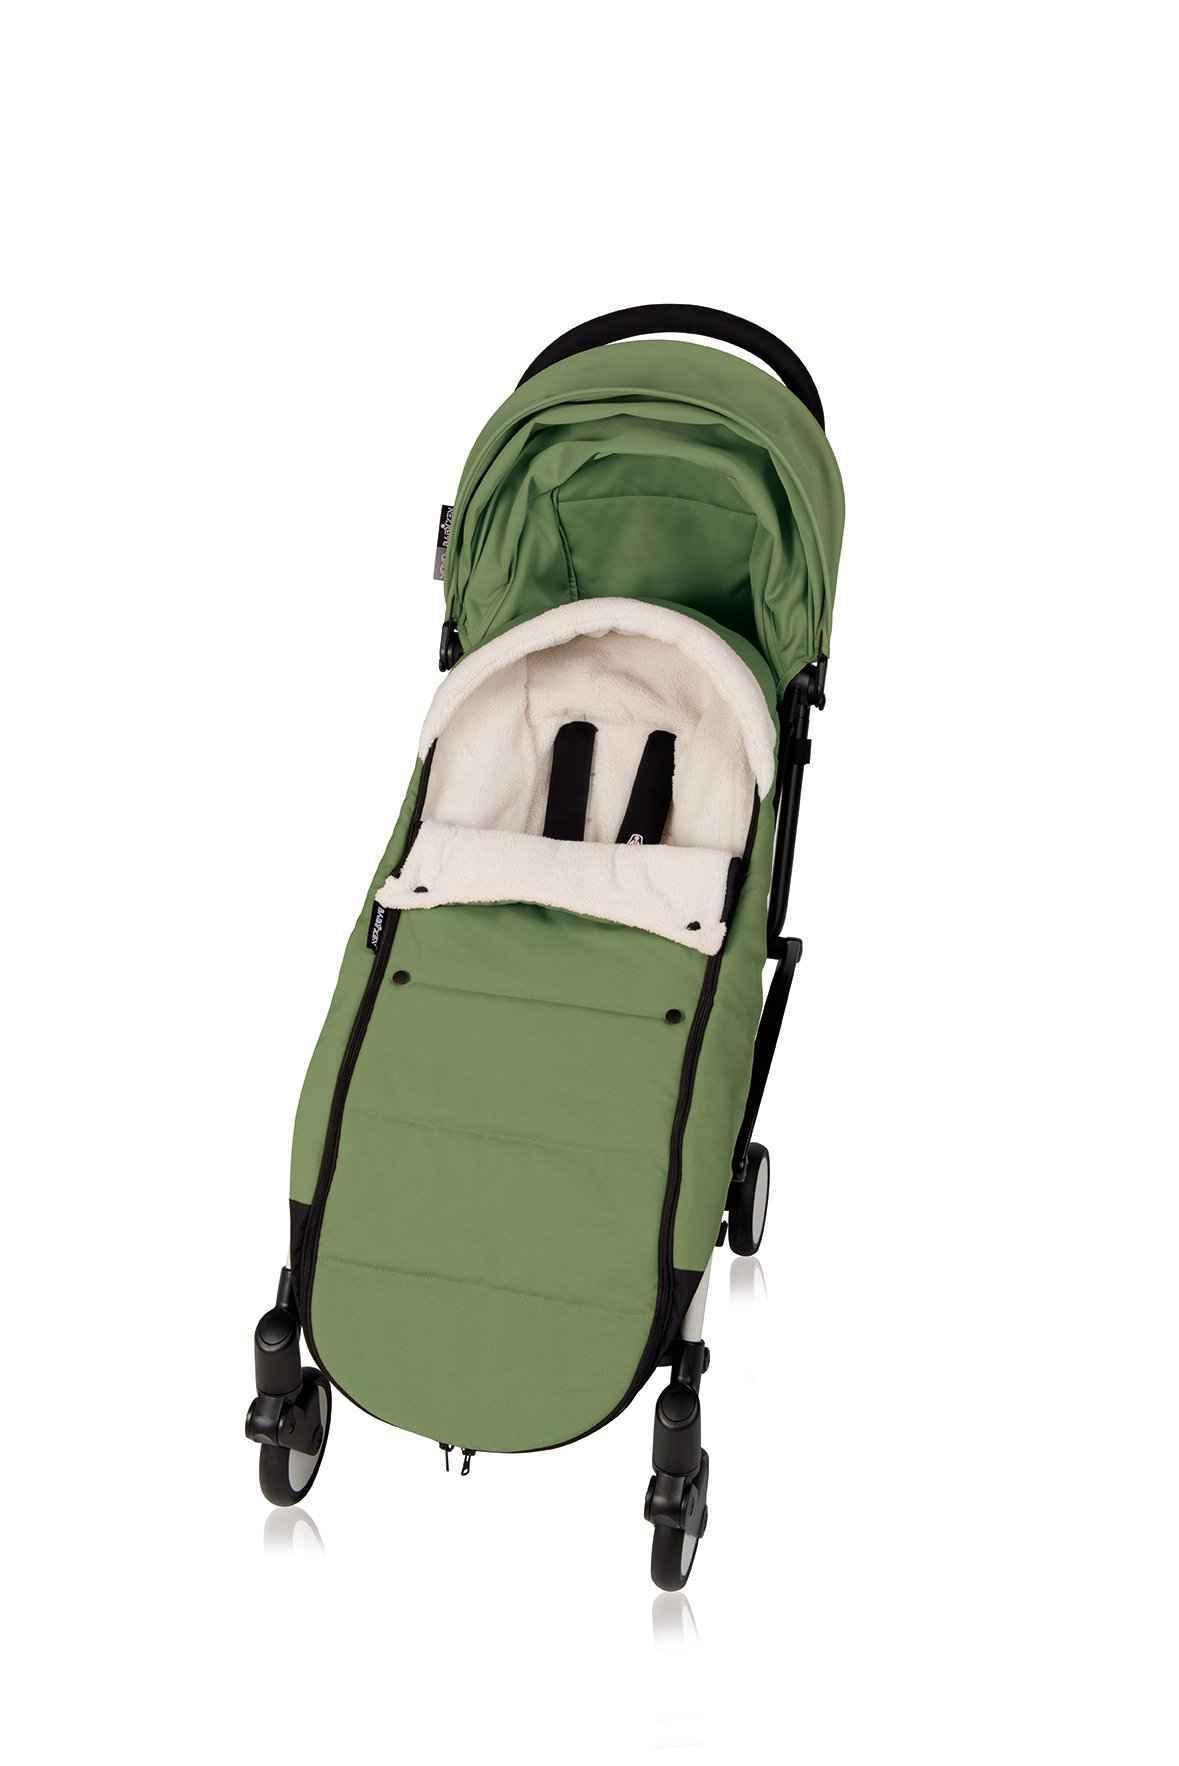 New Babyzen Yoyo Footmuff - Peppermint (stroller tidak termasuk)